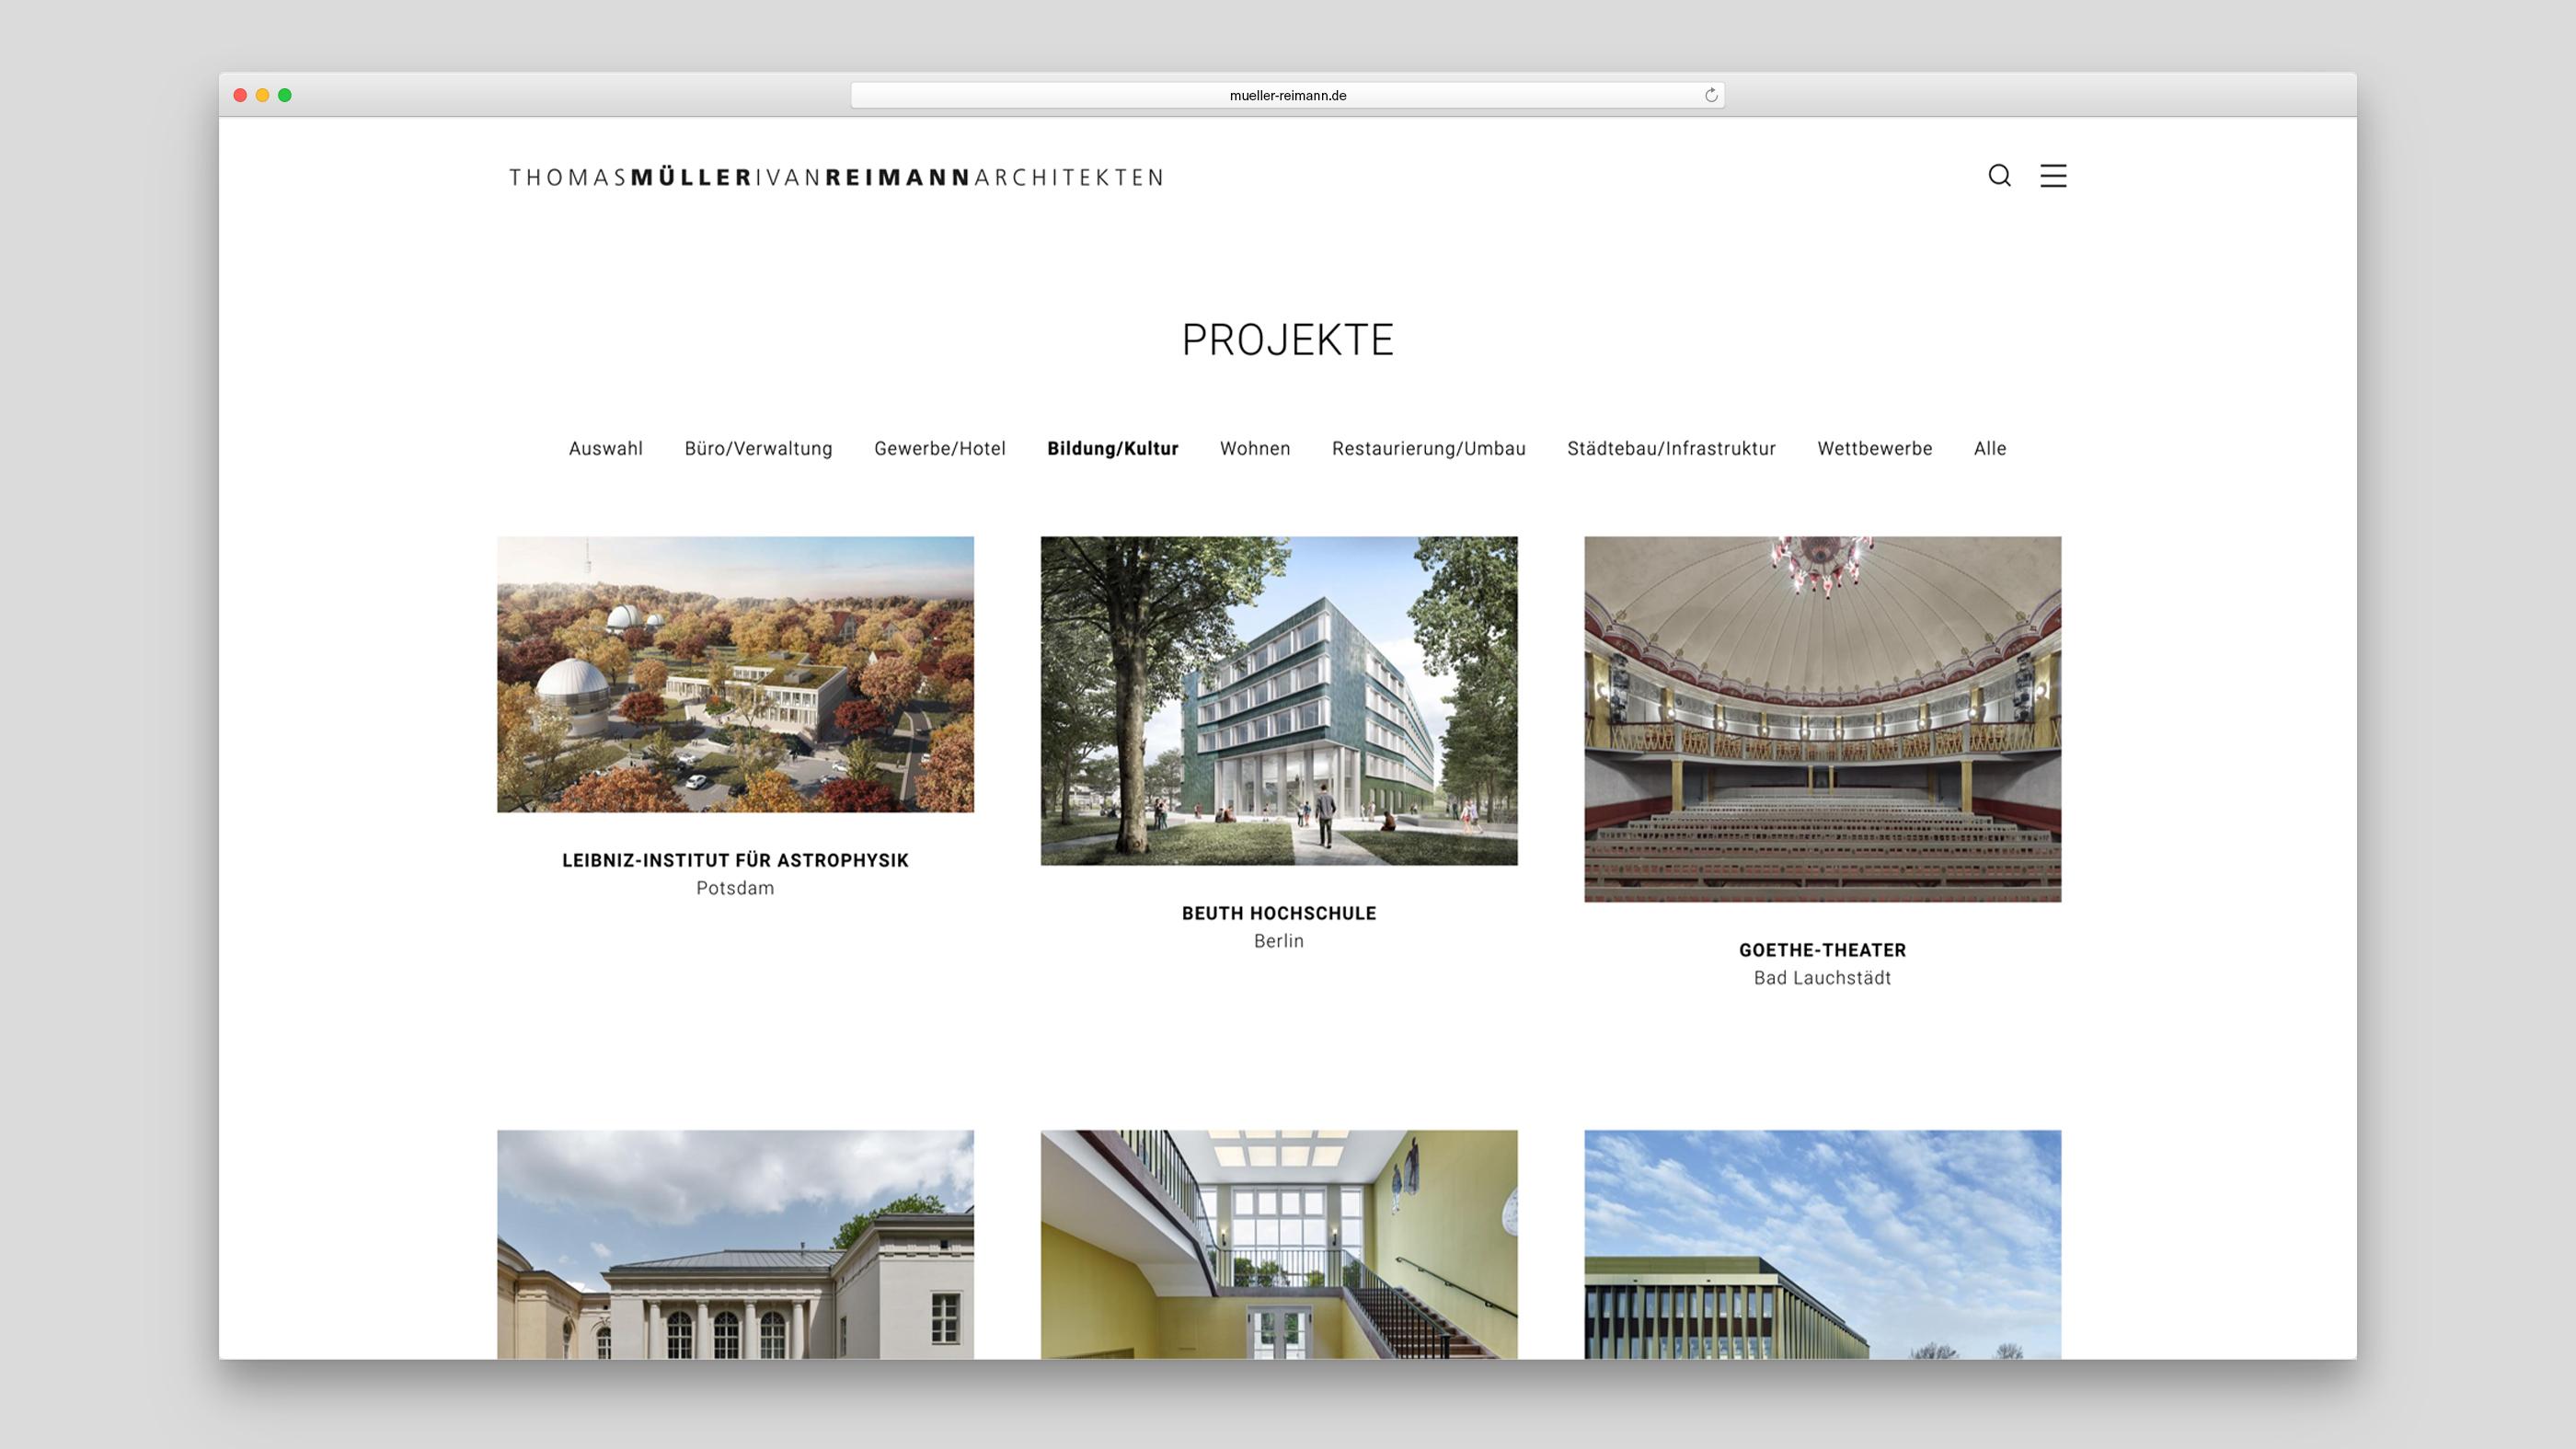 Gebäudeauswahl Projekte Bildung/Kultur